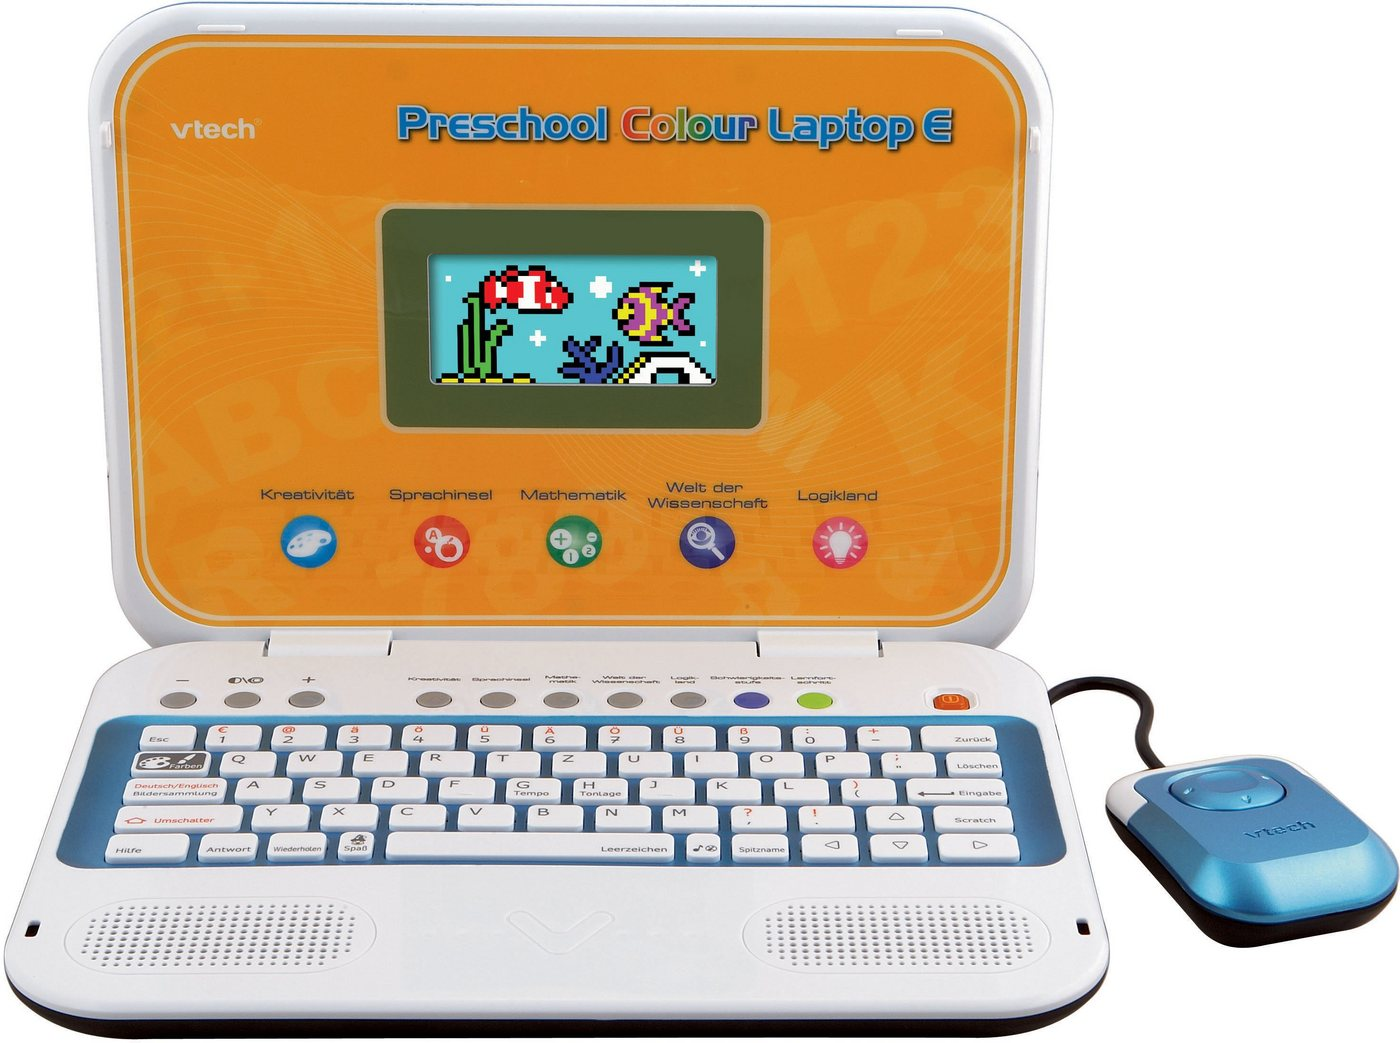 vtech preschool colour laptop e preisvergleich. Black Bedroom Furniture Sets. Home Design Ideas